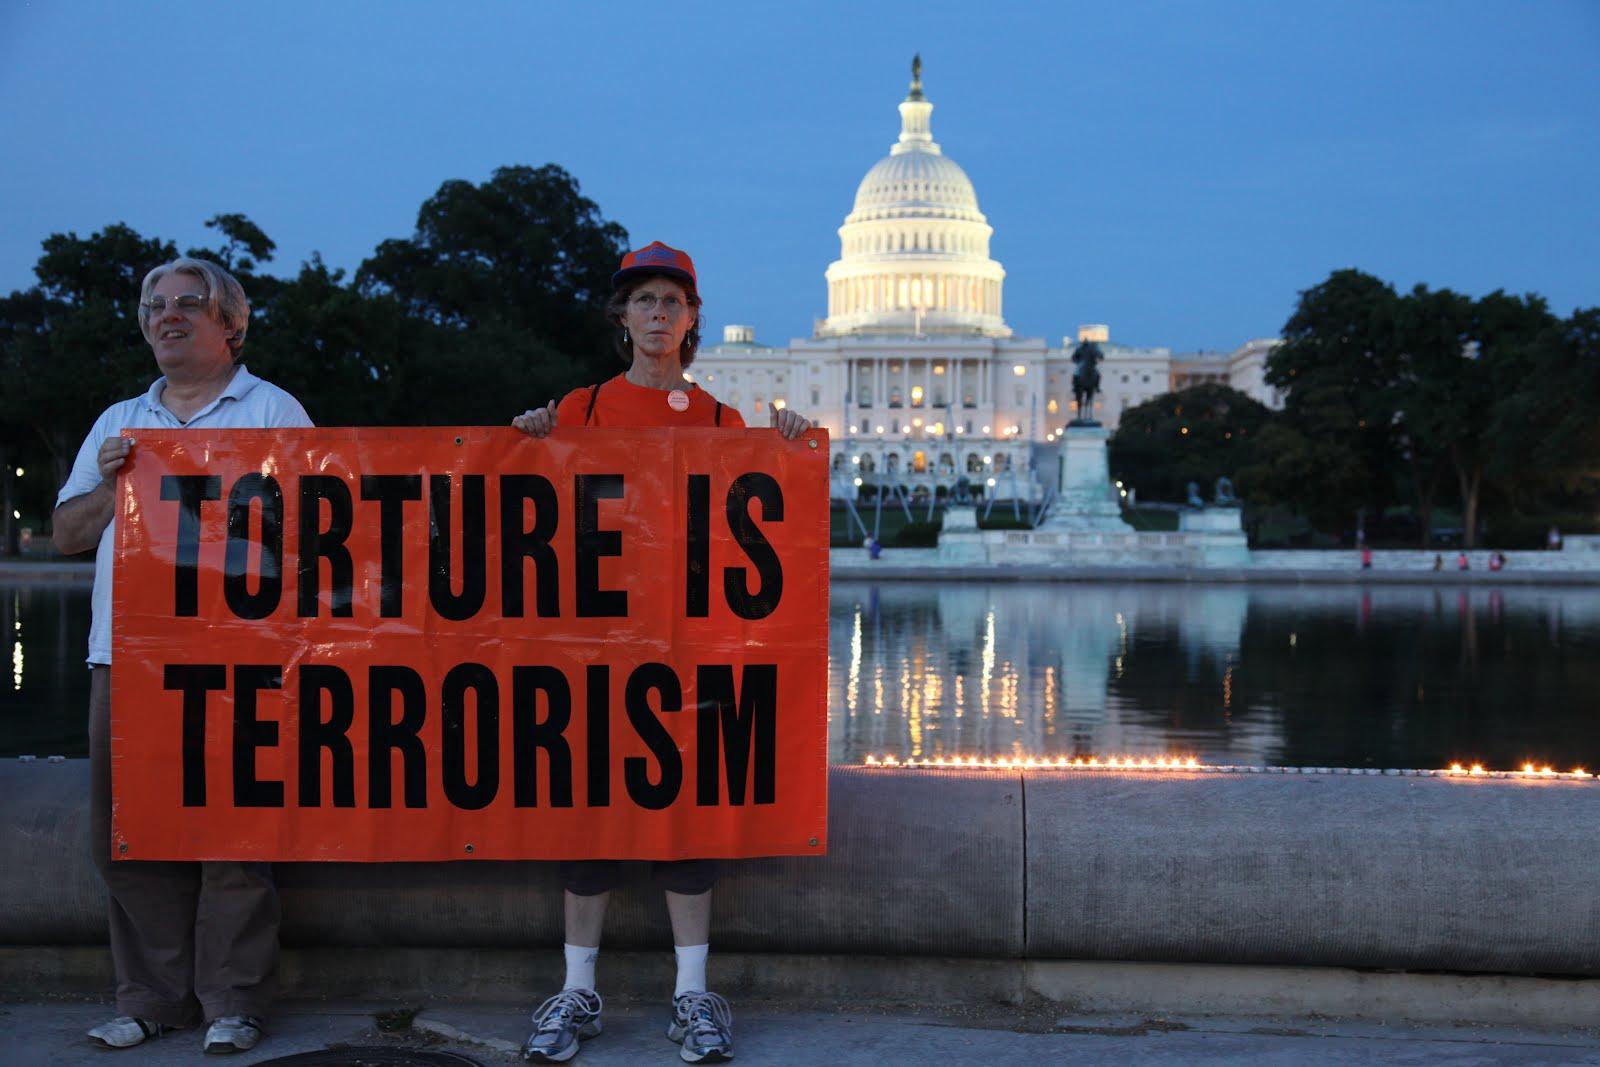 Is Torture Terrorism? Thumbnail Image